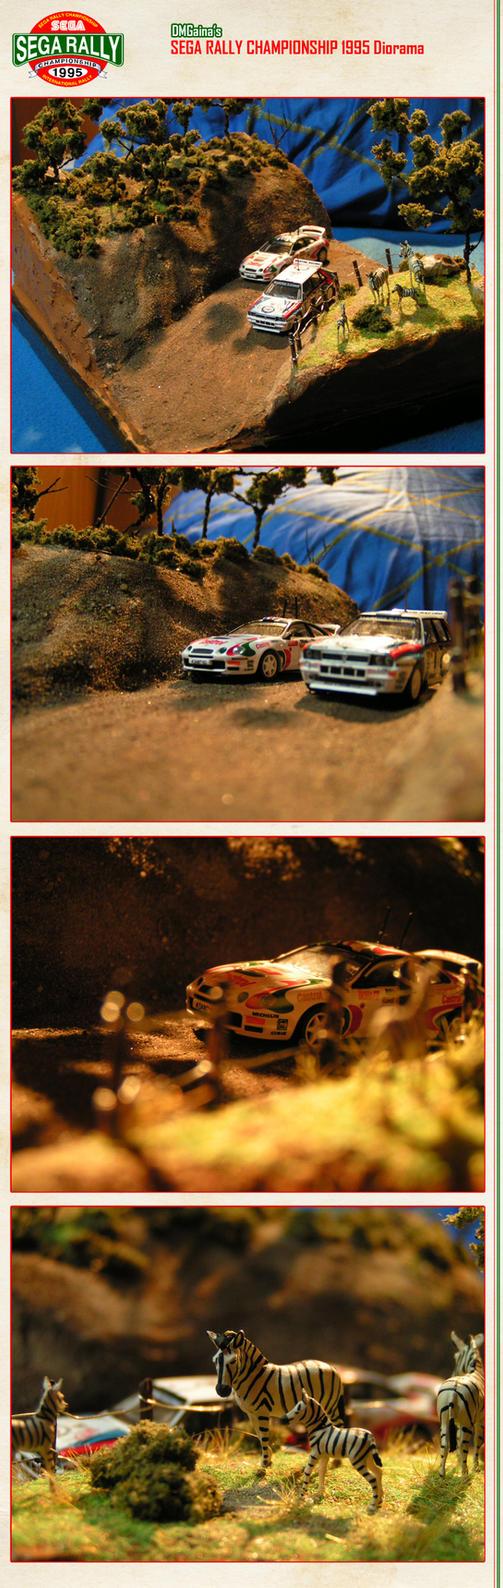 Sega Rally Championship 1995 - Diorama by DMGaina